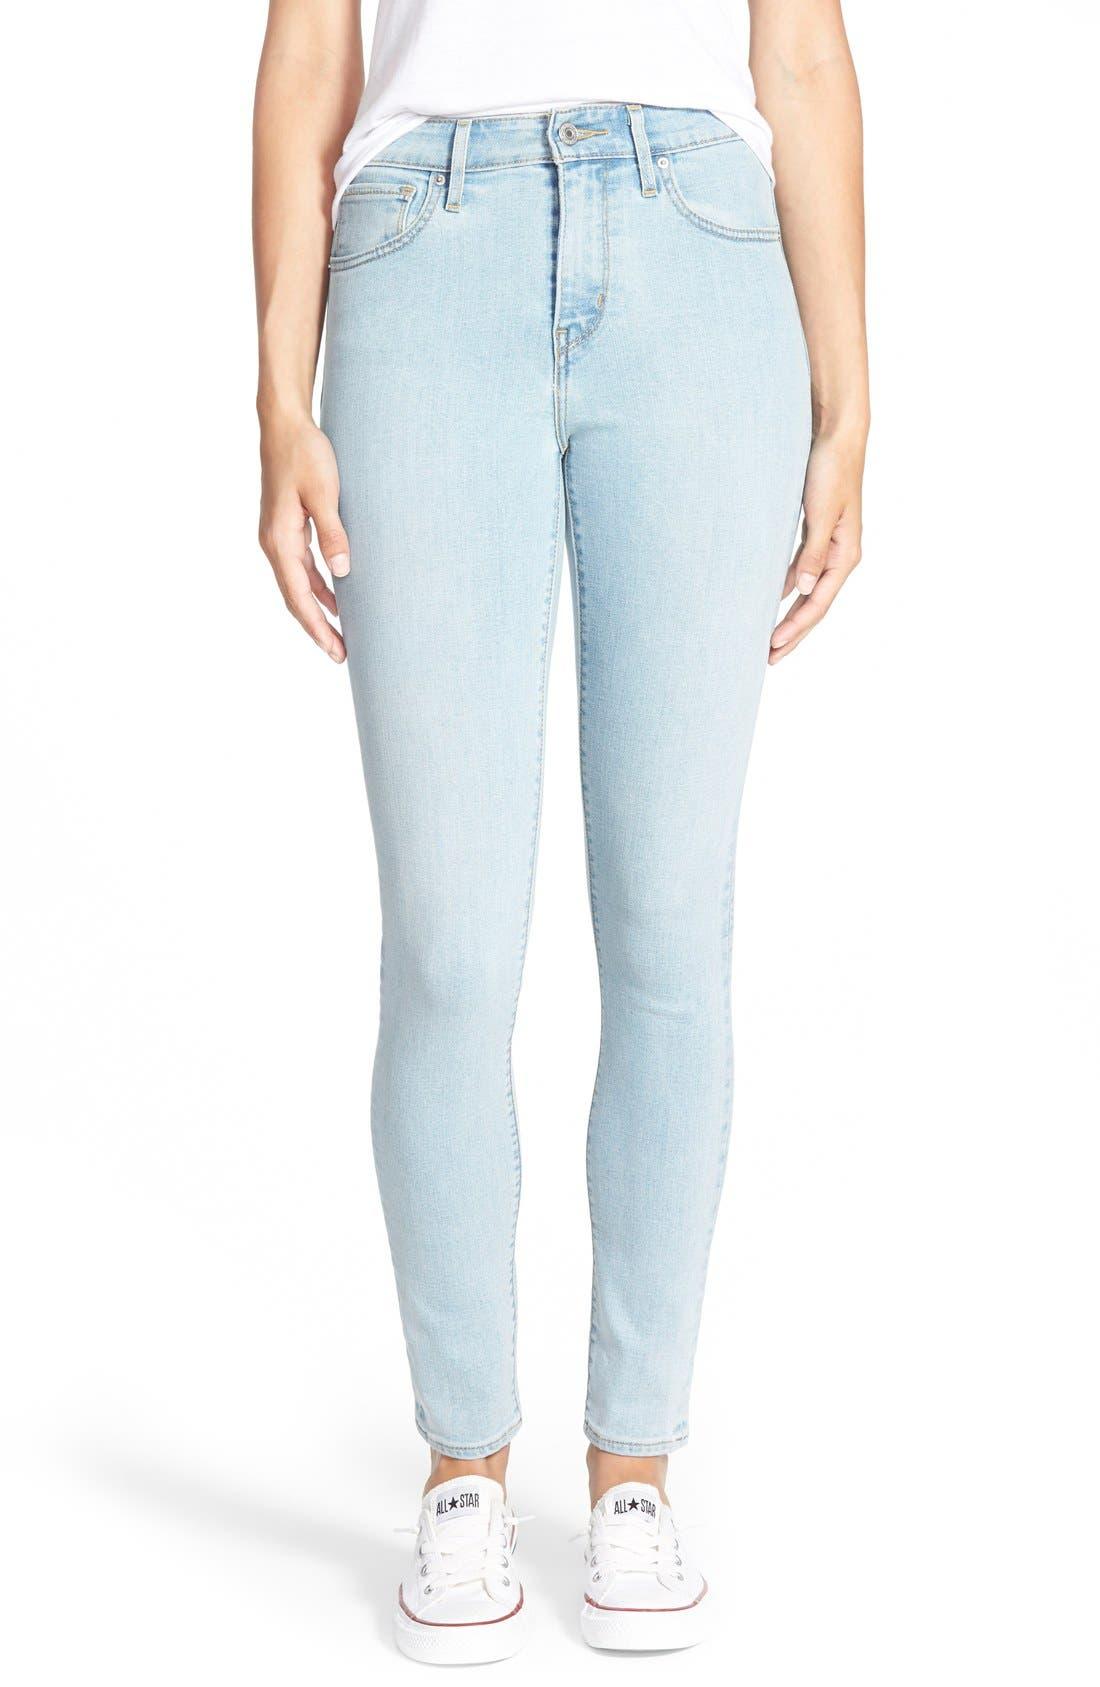 Main Image - Levi's® '721' High Rise Skinny Jeans (Light)